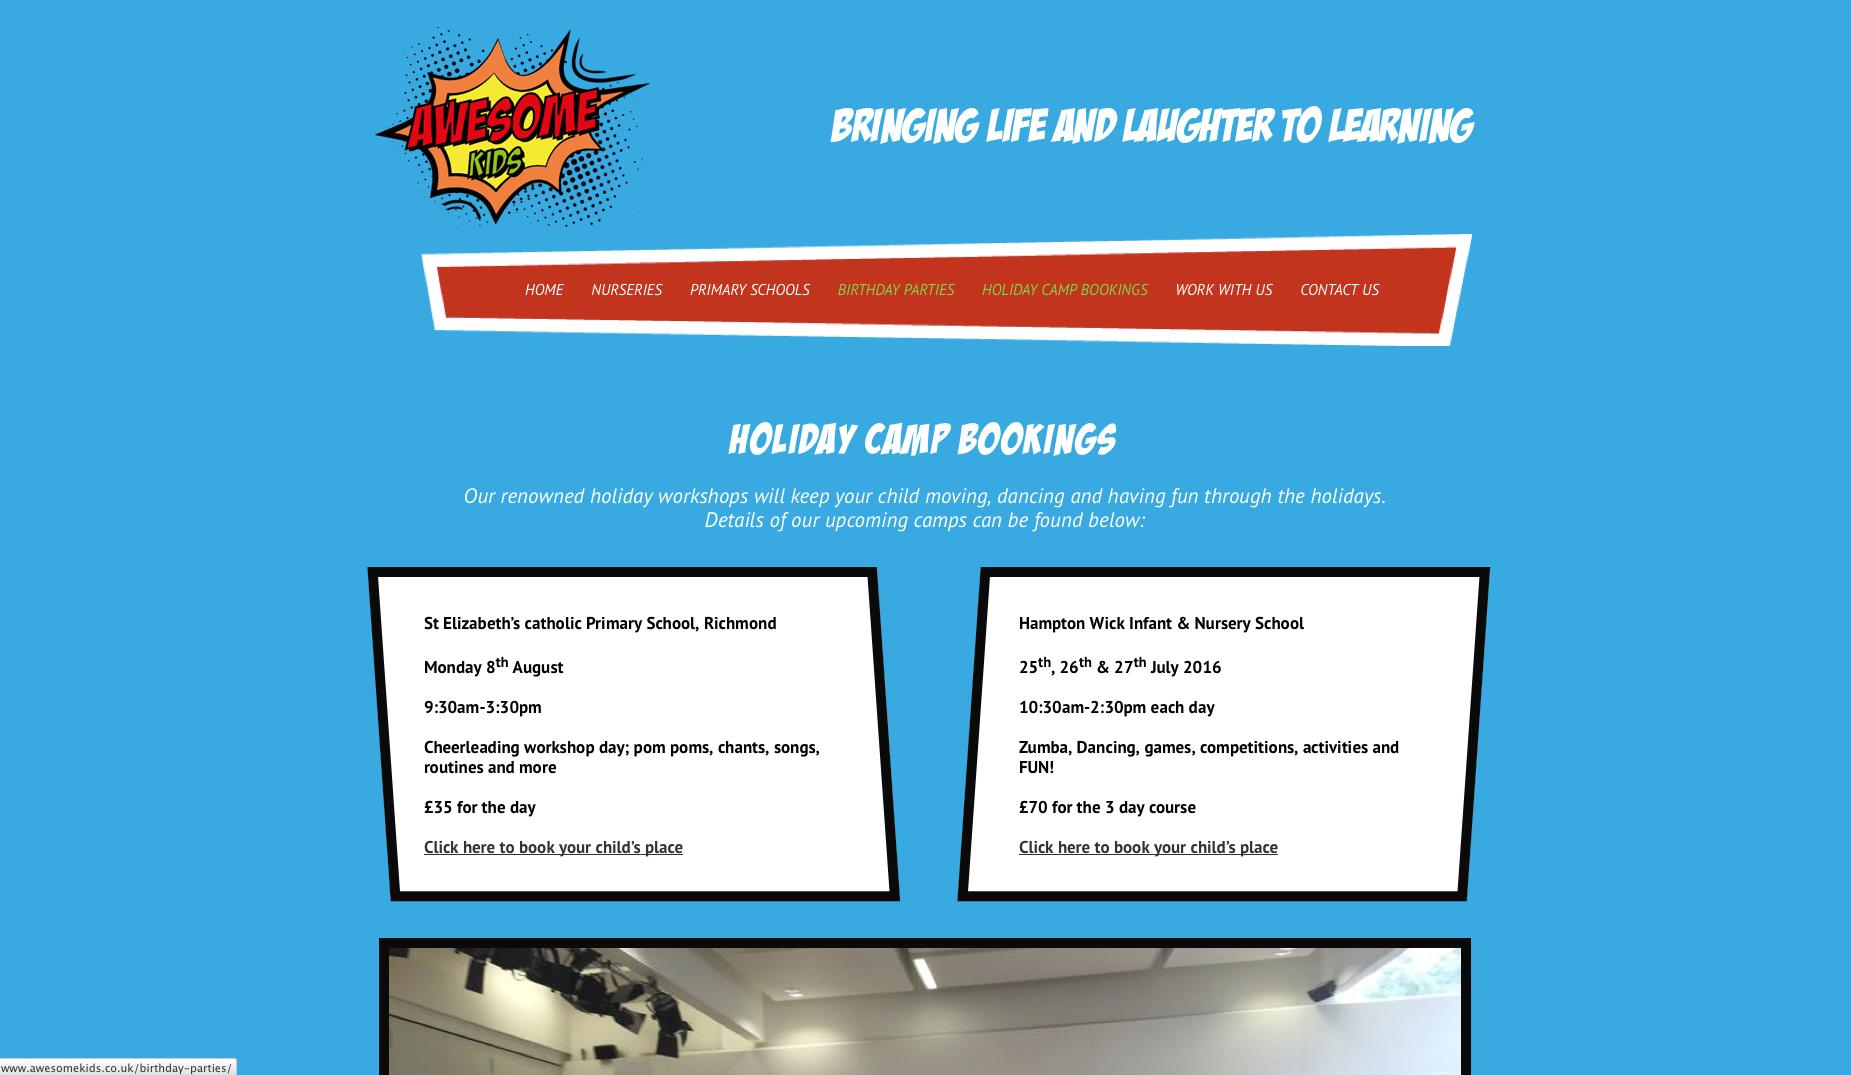 Awesome Kids Holiday Camp webpage screenshot